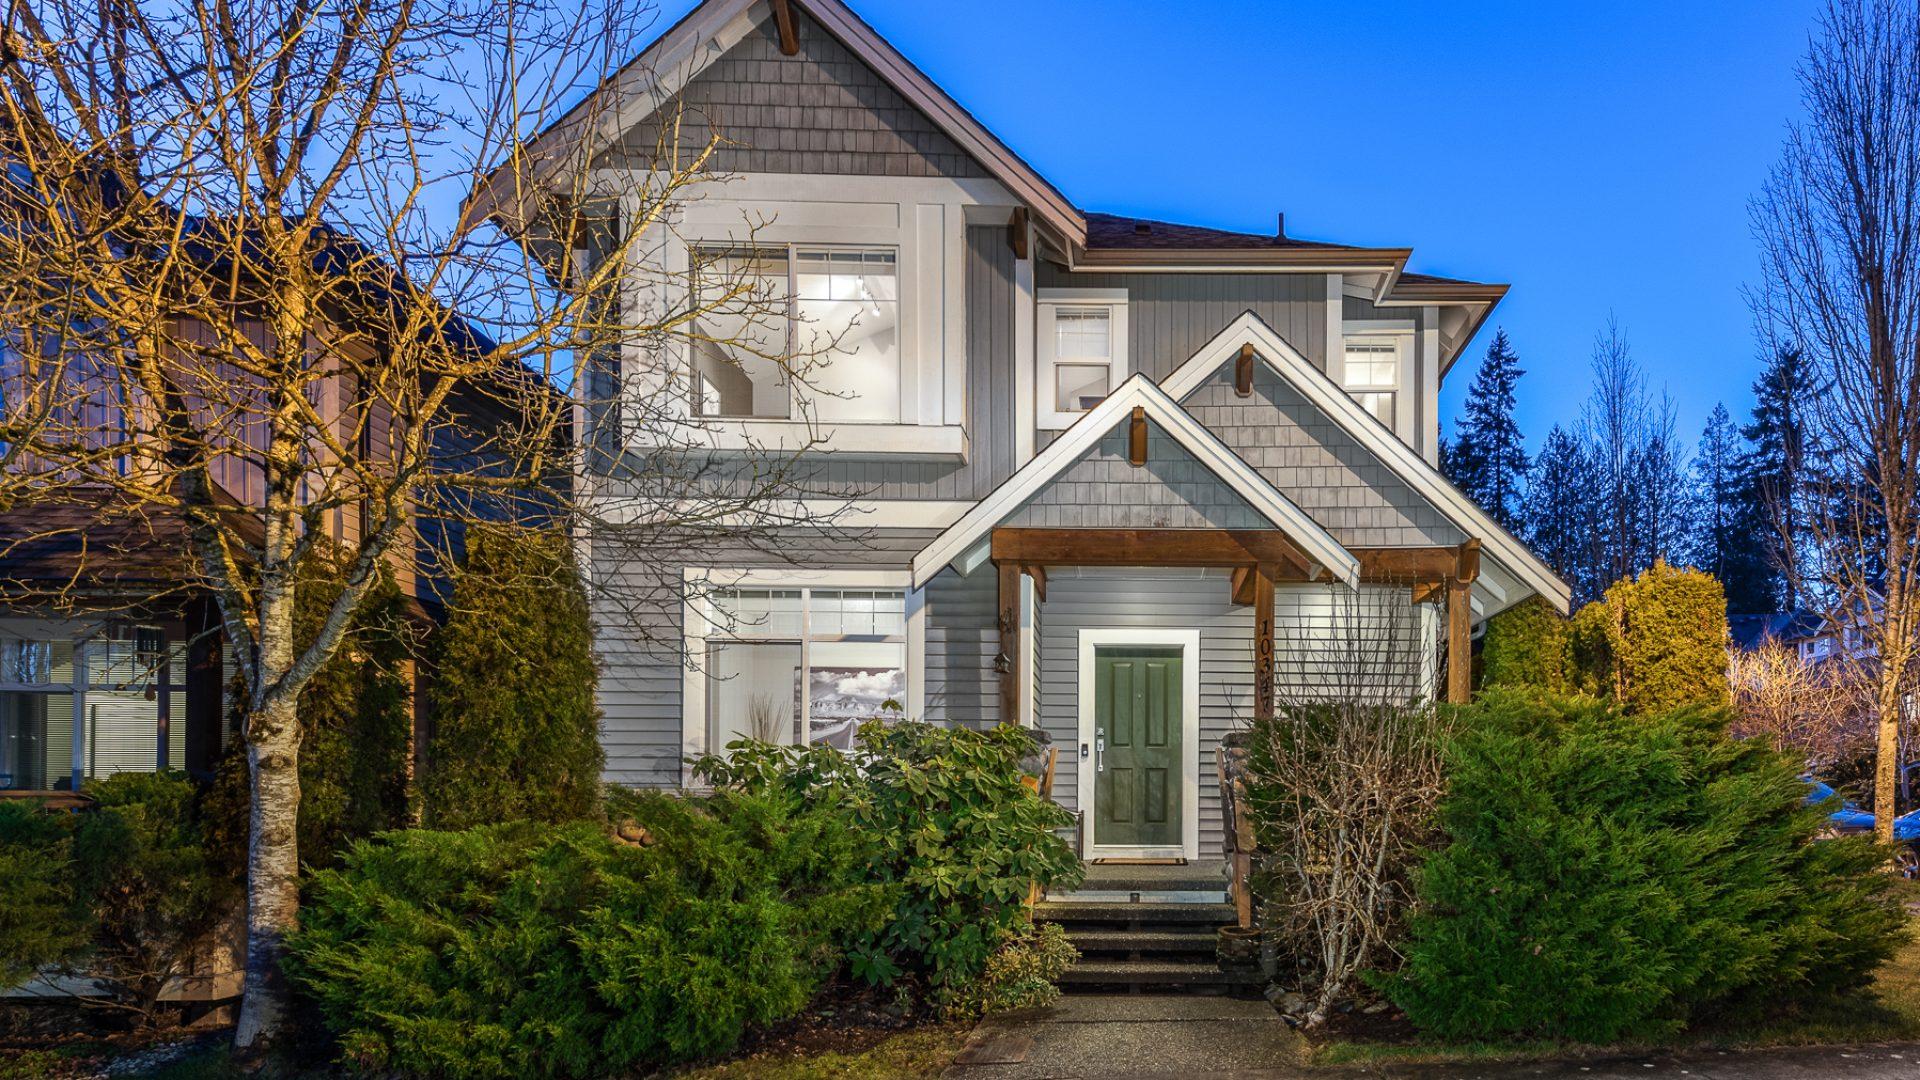 10347-243A-Street-Maple-Ridge-360hometours-01s